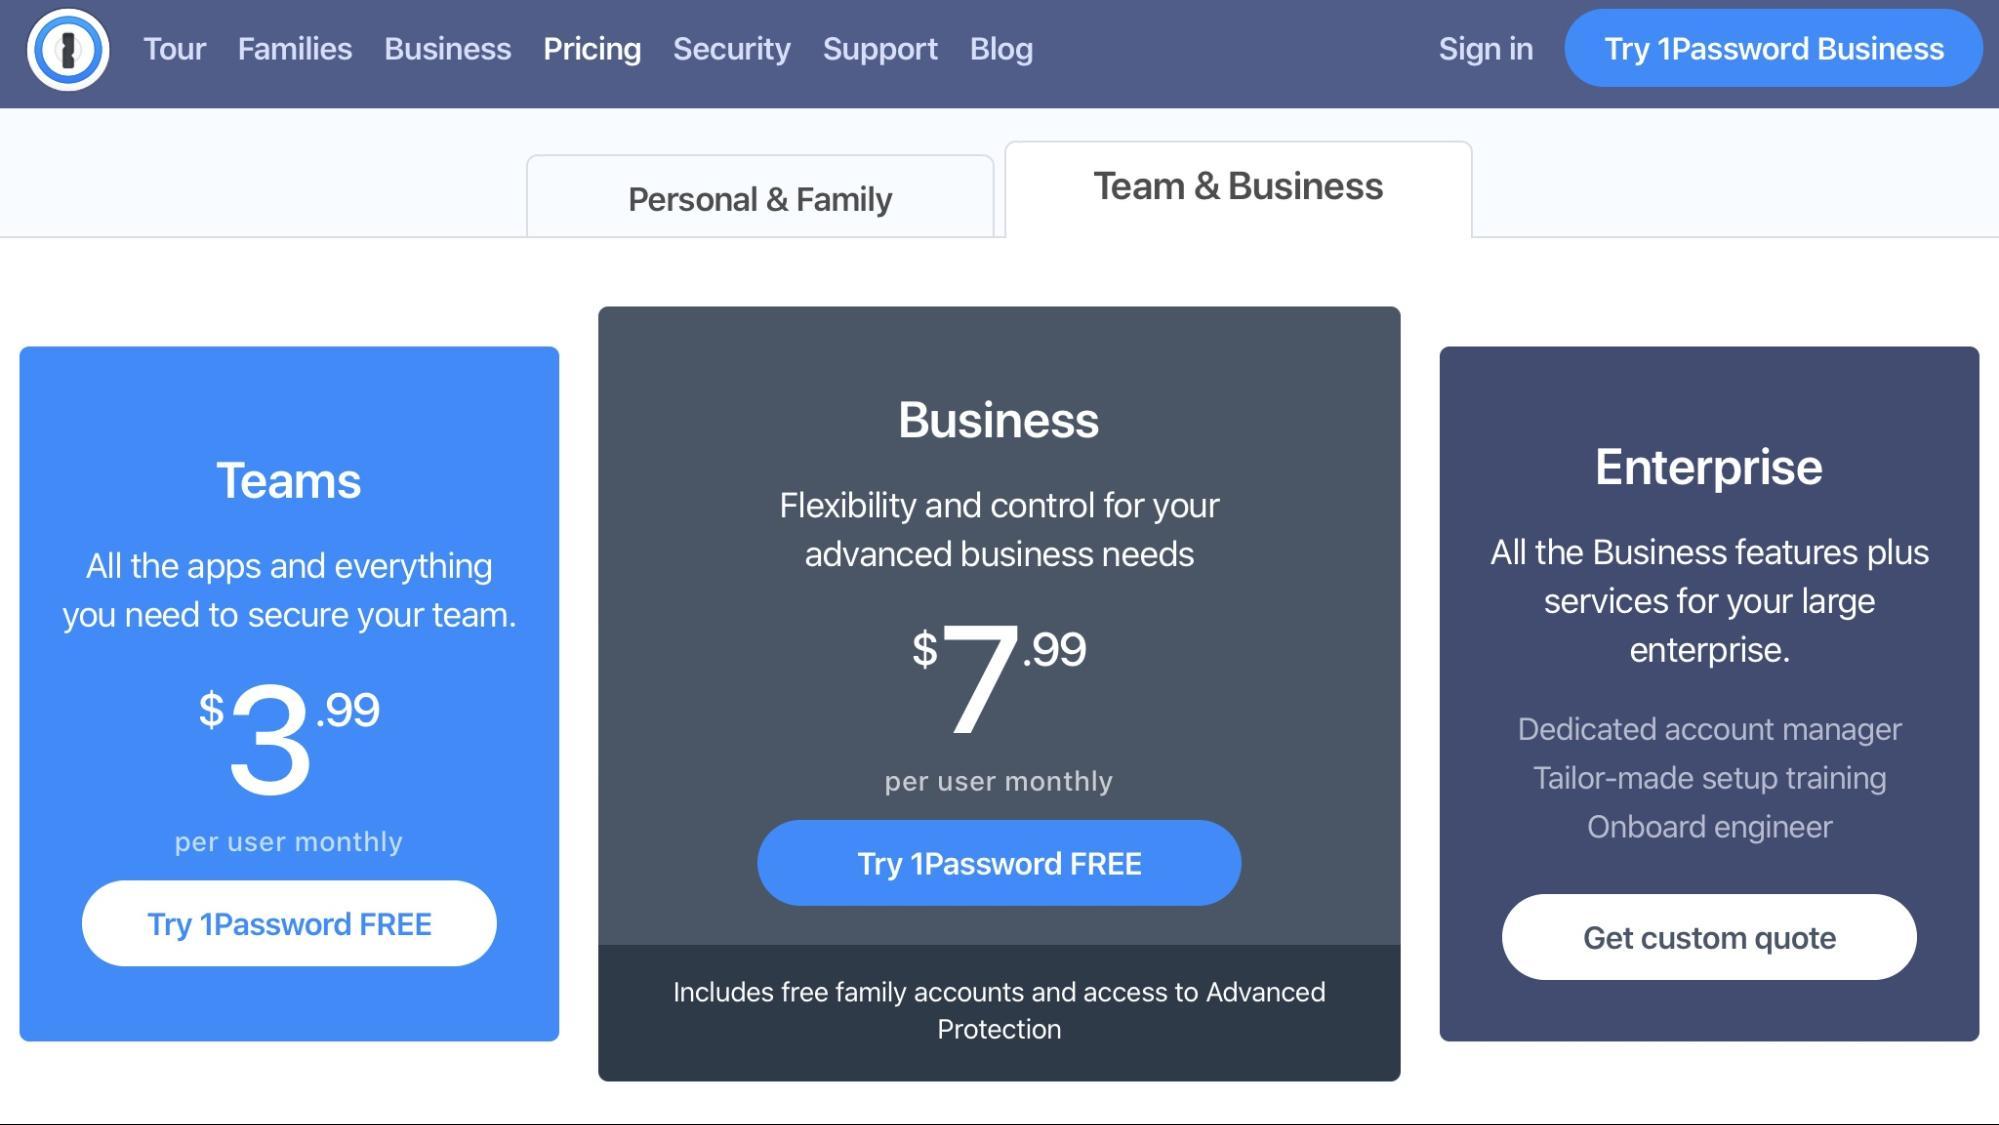 1Password team subscriptions start at $3.99 per user per month.